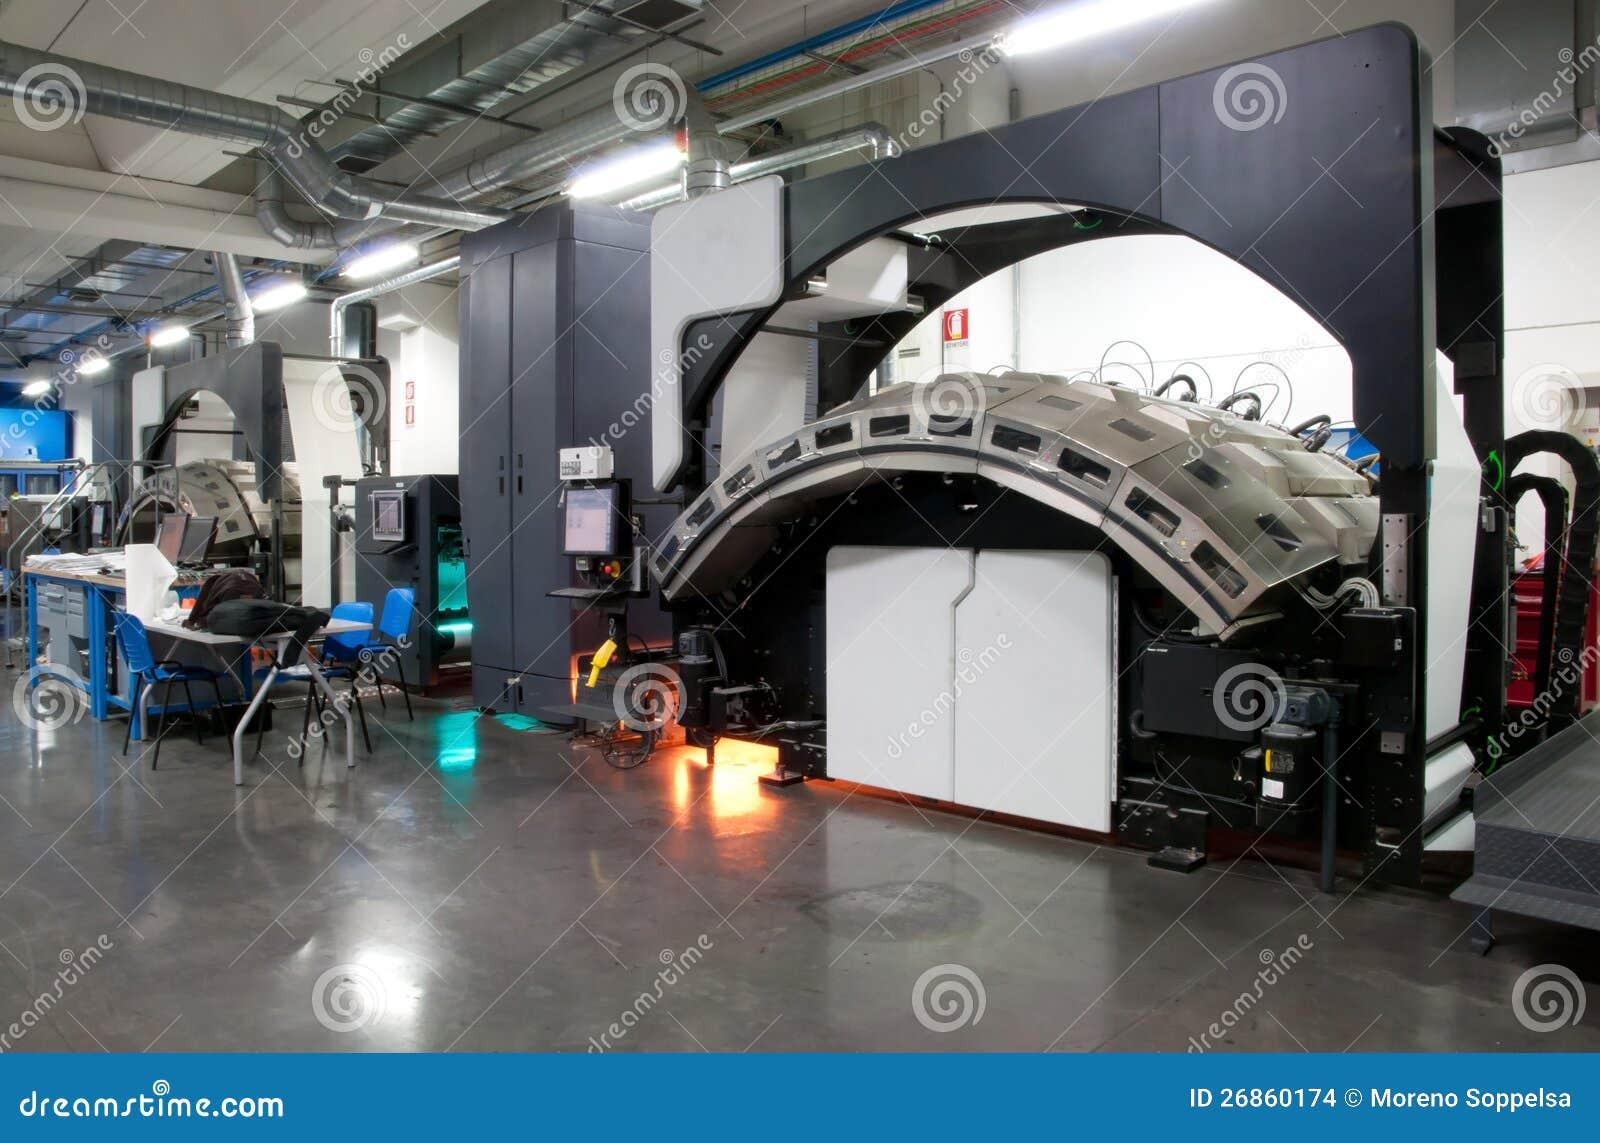 Printing Machine: Digital Web Press Stock Photo - Image of magazine